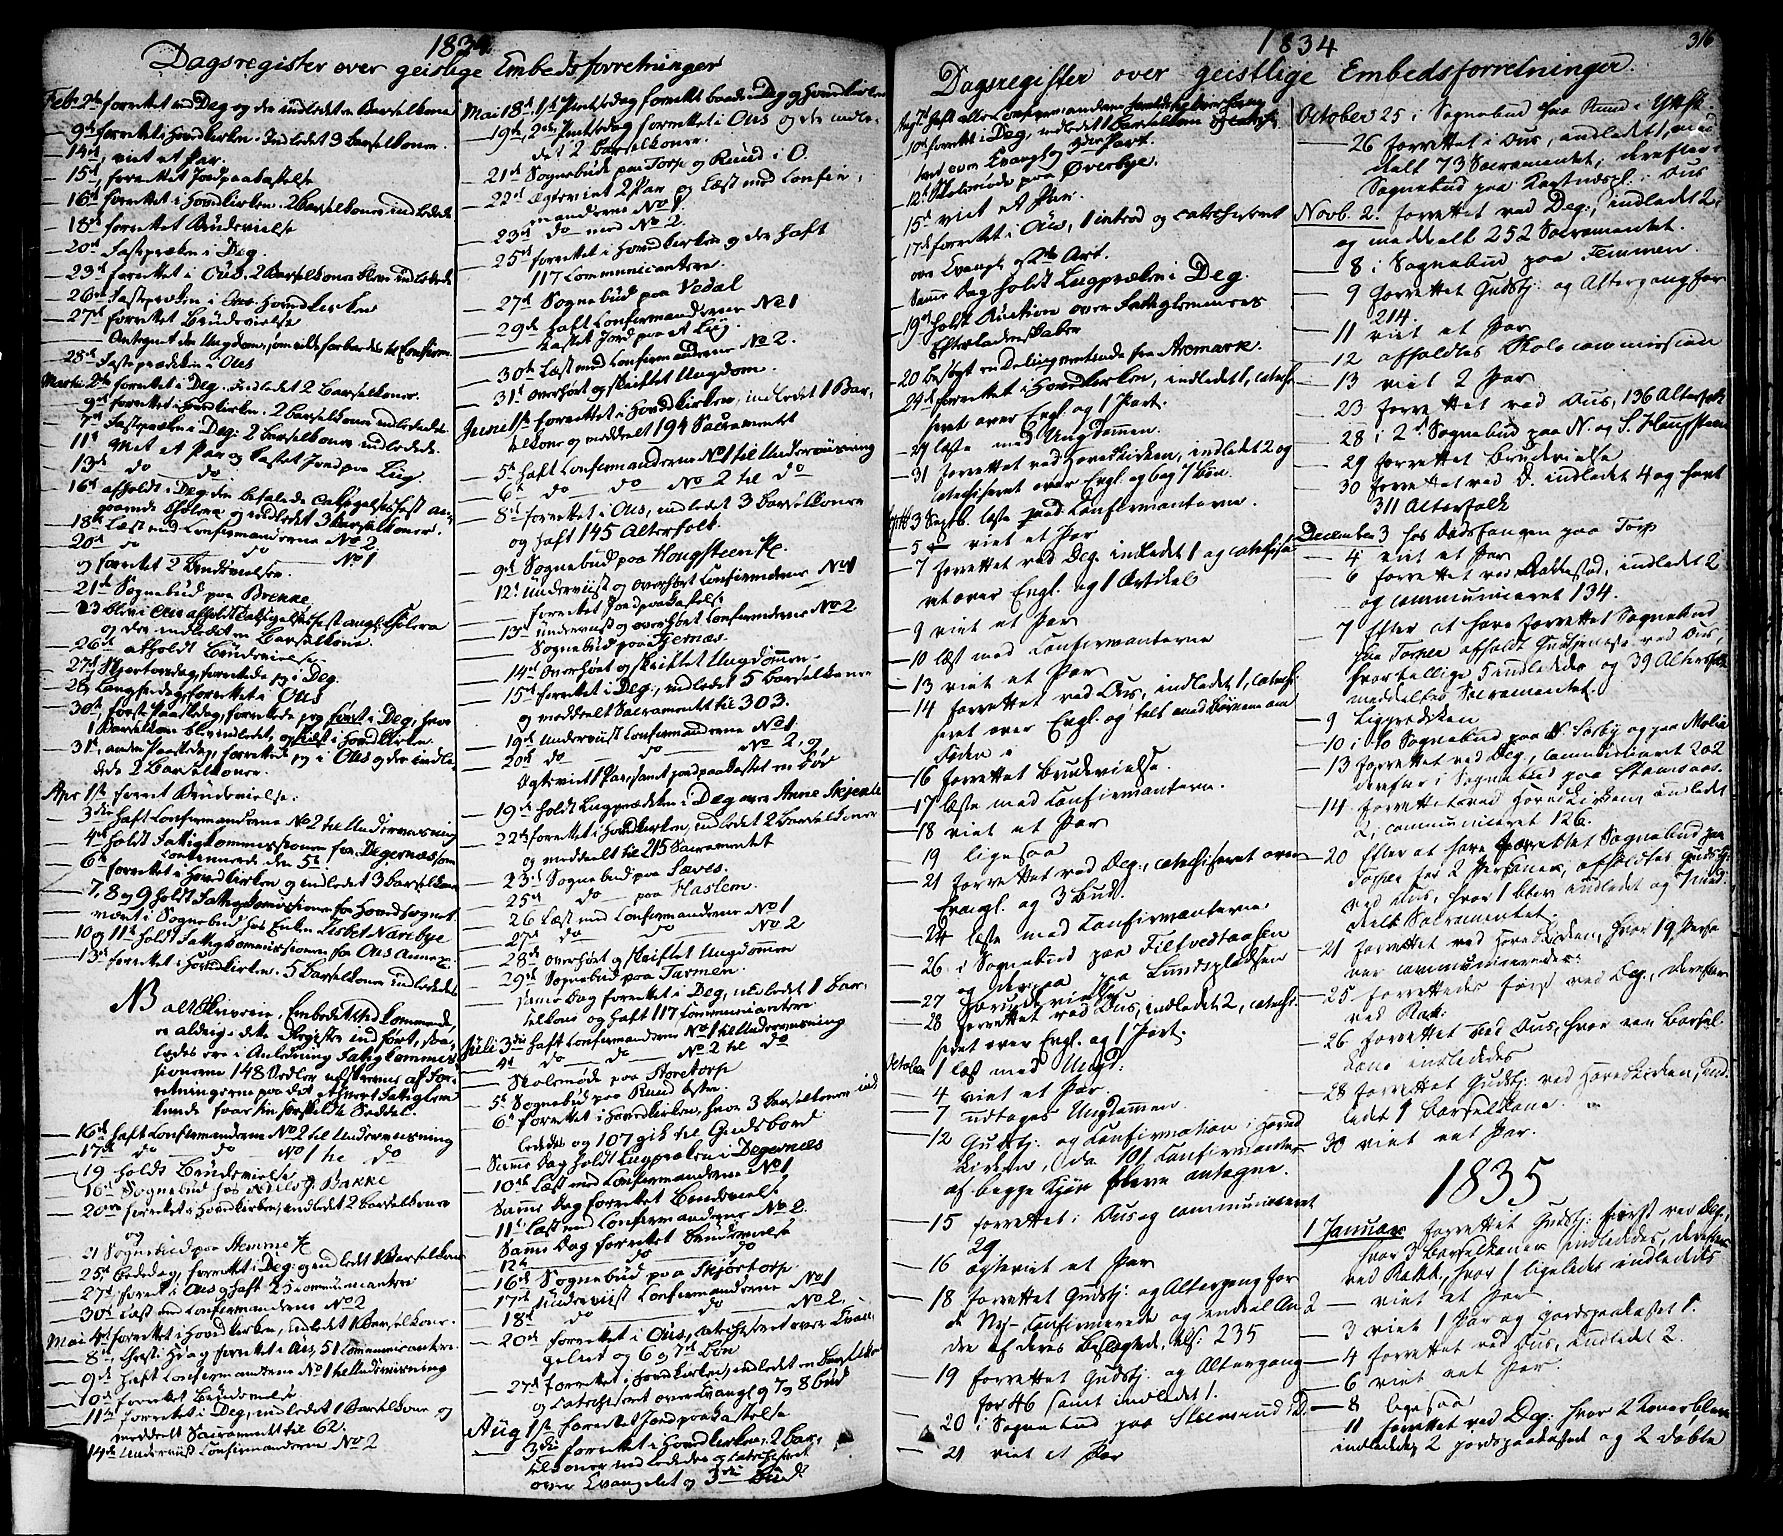 SAO, Rakkestad prestekontor Kirkebøker, F/Fa/L0007: Ministerialbok nr. I 7, 1825-1841, s. 316